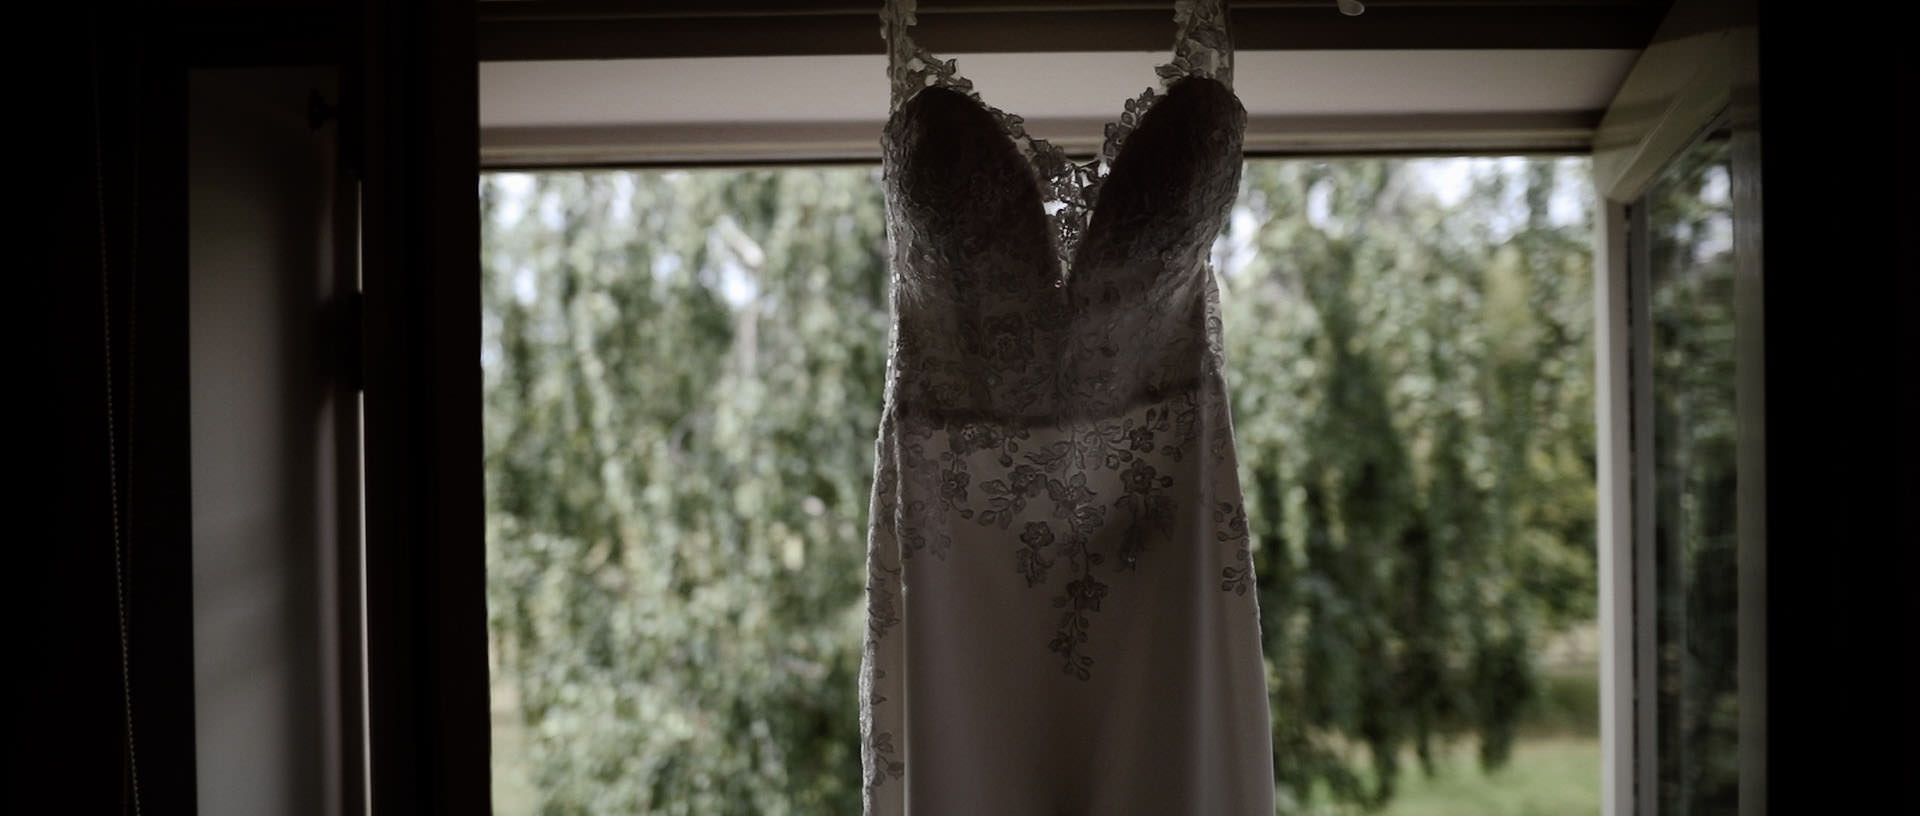 Hyde Barn Colswolds Wedding Verity-Jade & Kai 7 Cropped.jpg